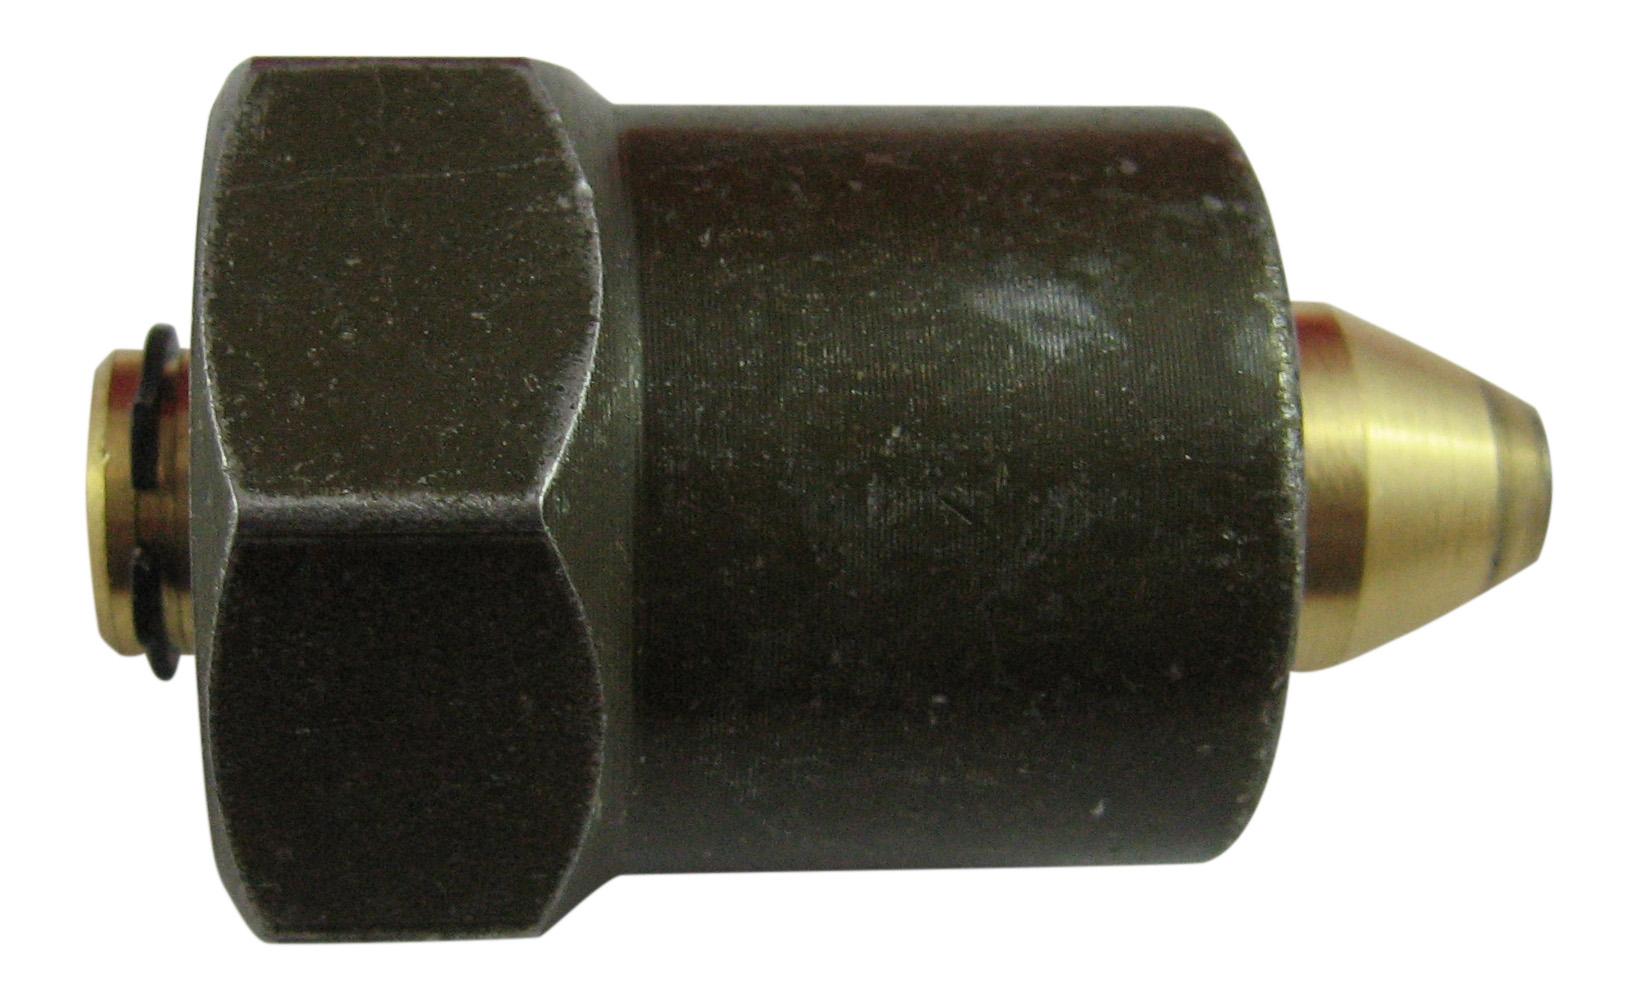 Diesel Injector Block-Off Tool Replaces Miller 9864 Cap Fits 6.7L Cummins